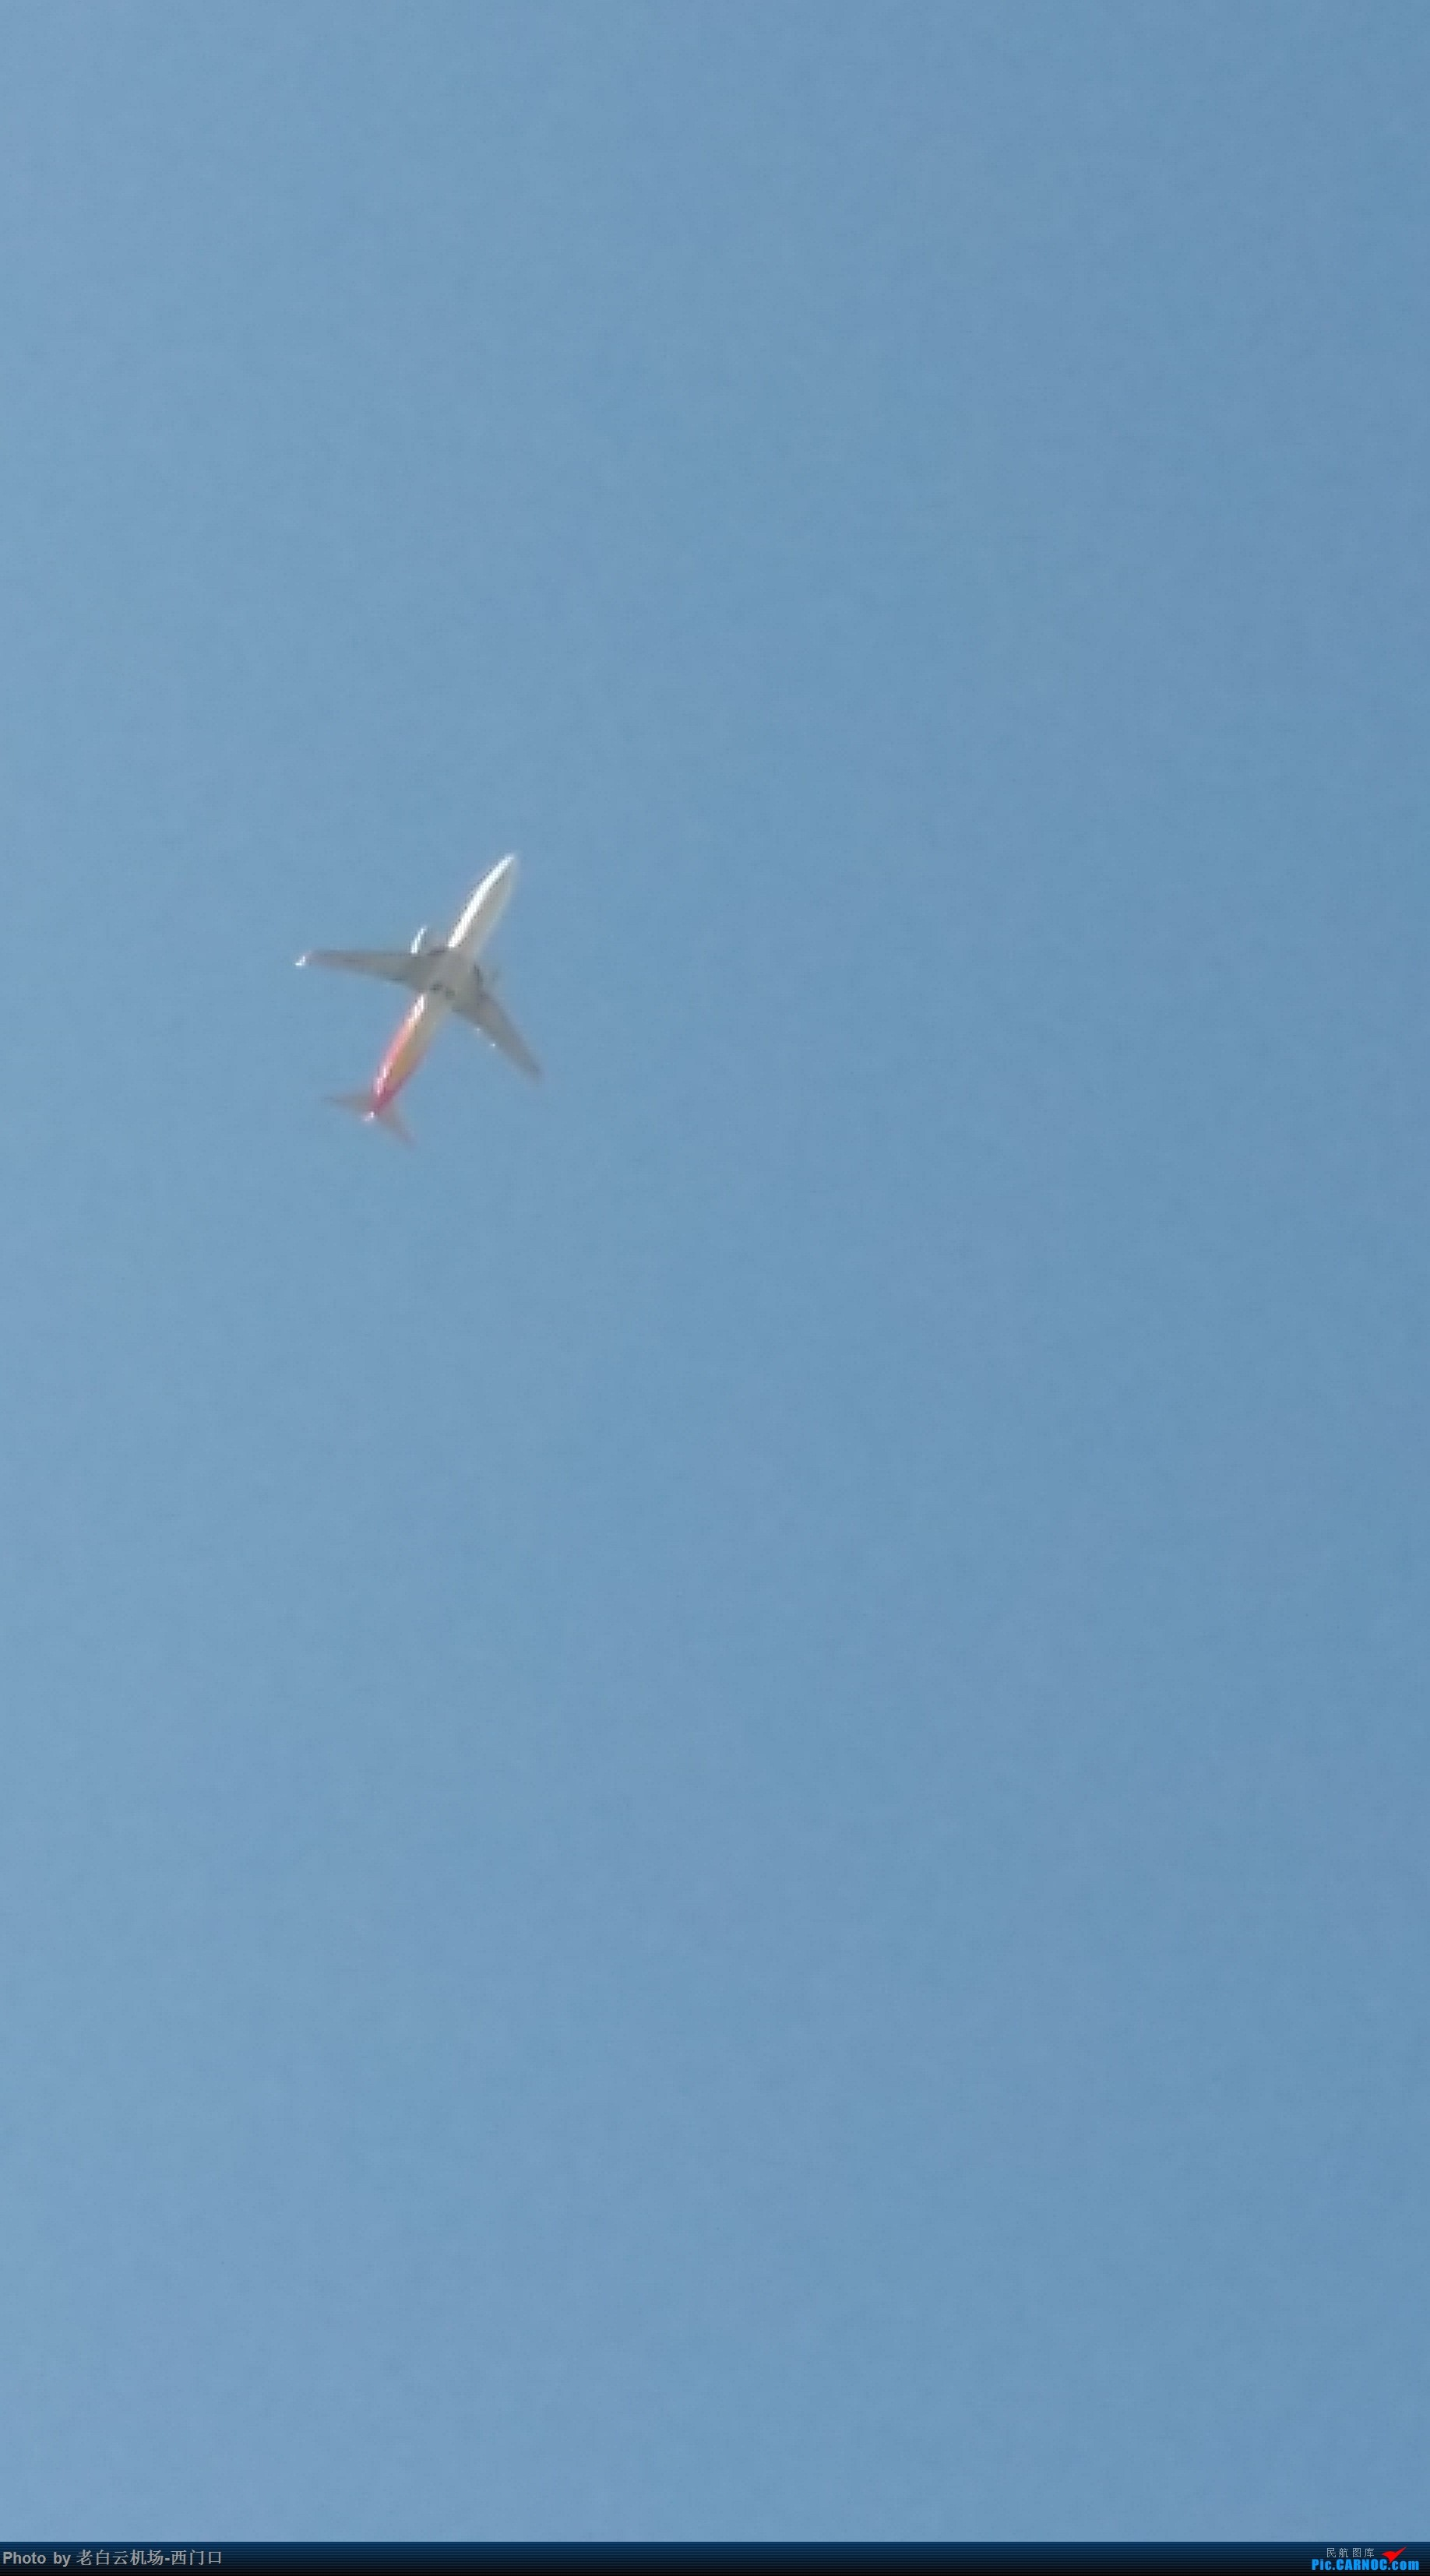 Re:[原创]我的拍飞机心情(广州) BOEING 737-800 不明 中国广东省广州市荔湾区四中聚贤中学上空